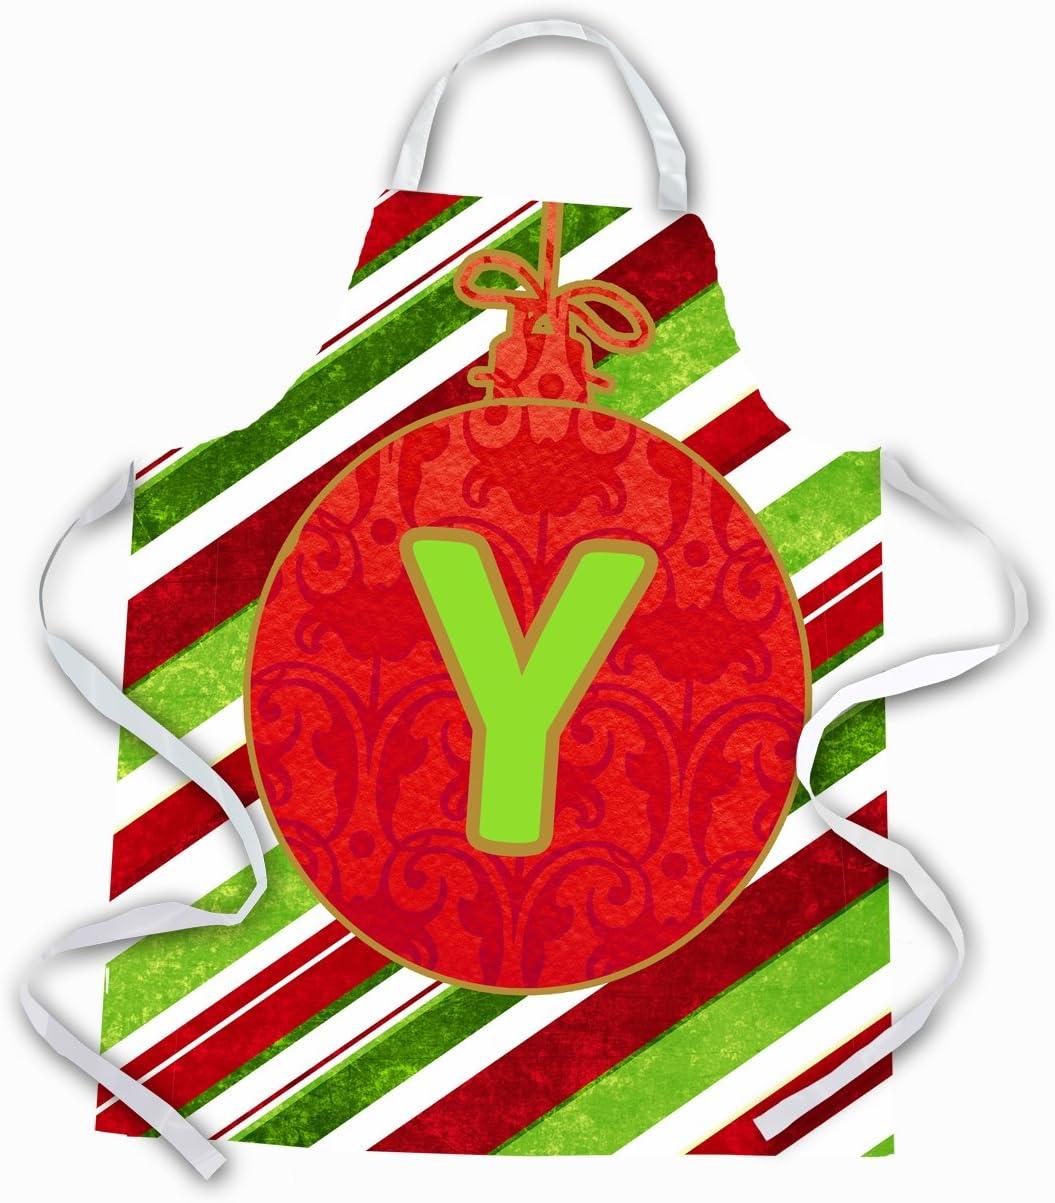 Large Carolines Treasures CJ1039-YAPRON Christmas Oranment Holiday Initial Letter Y Apron Multicolor